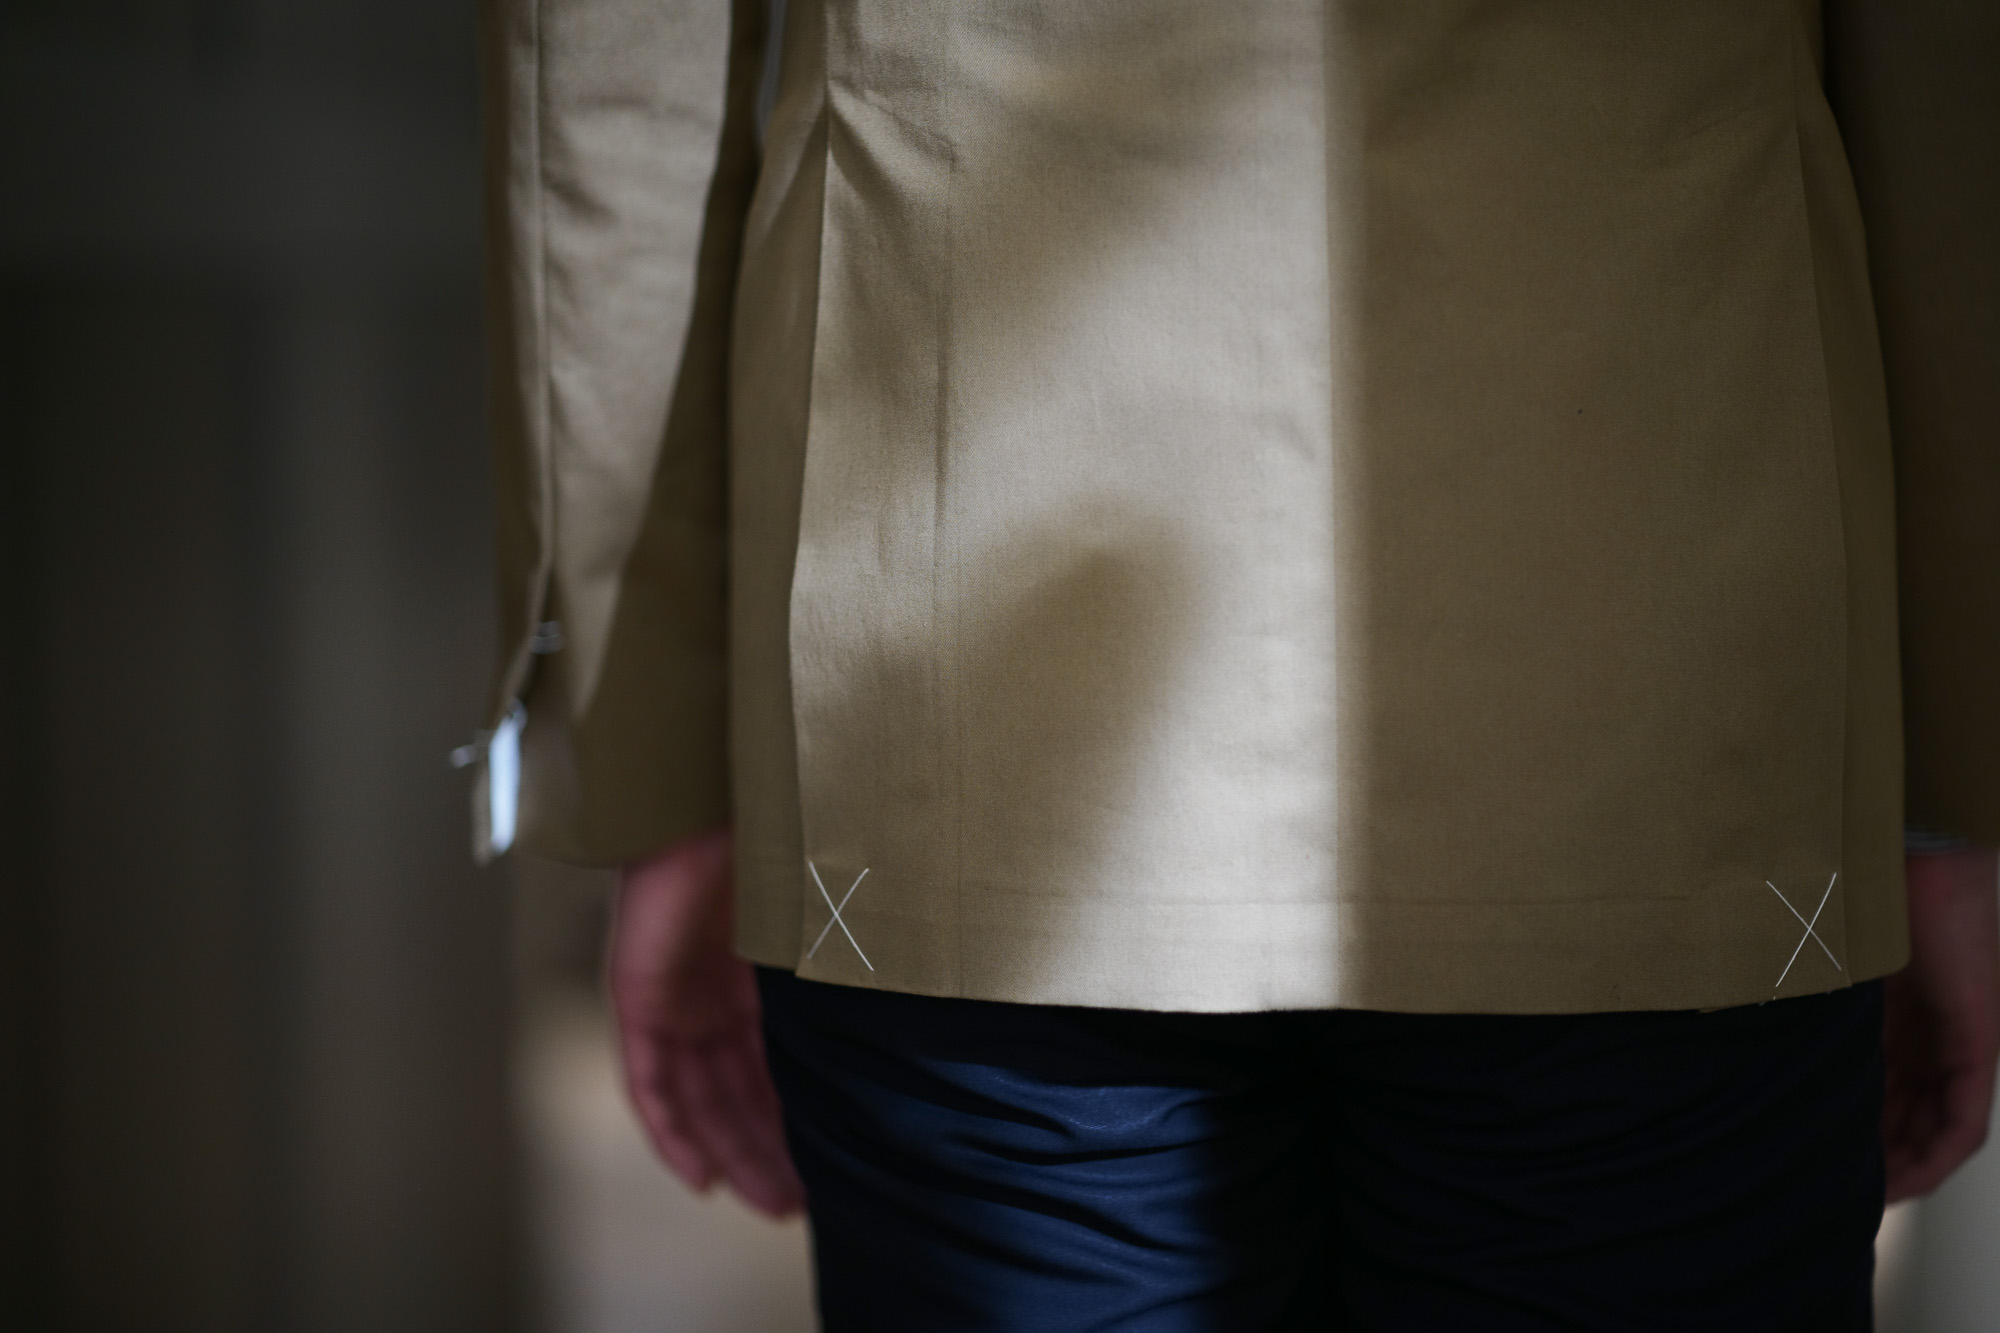 De Petrillo / デ・ペトリロ (2019 春夏 メイン 展示会) ジャケット スーツ チノスーツ チノ素材 コットン 名古屋 Alto e Diritto アルト エ デリット コーディネート alto e diritto アルトエデリット